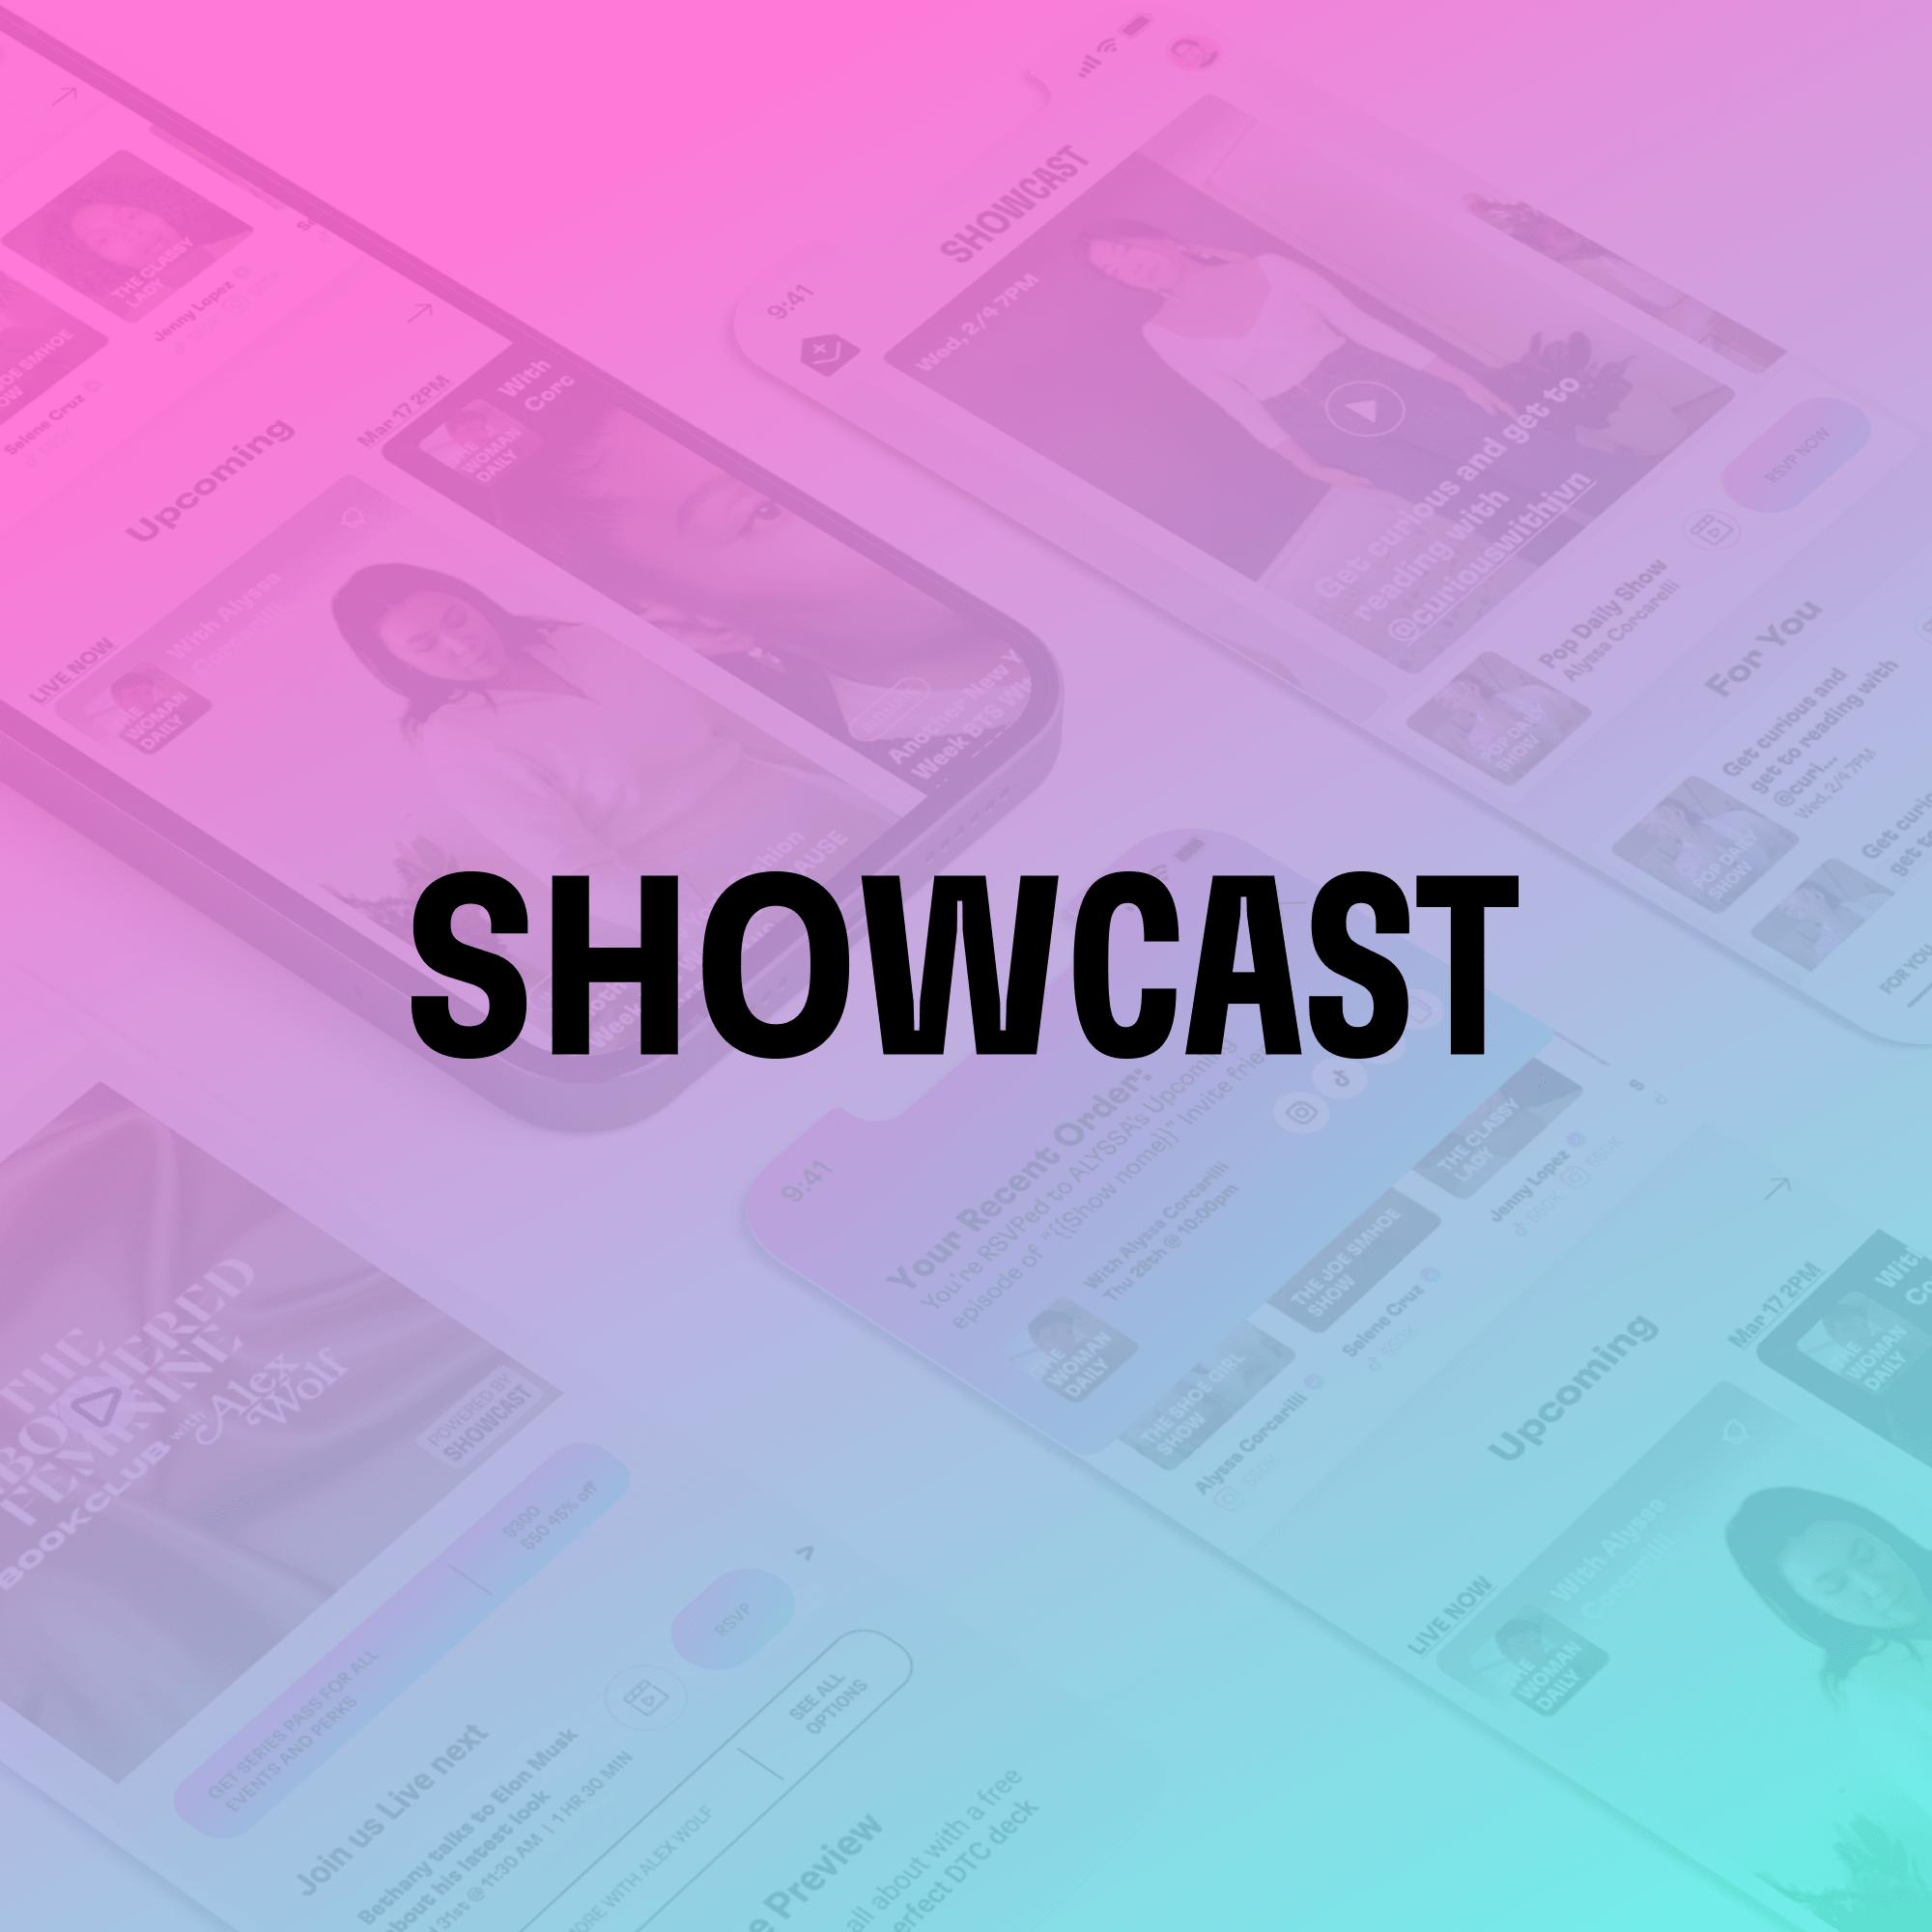 Showcast